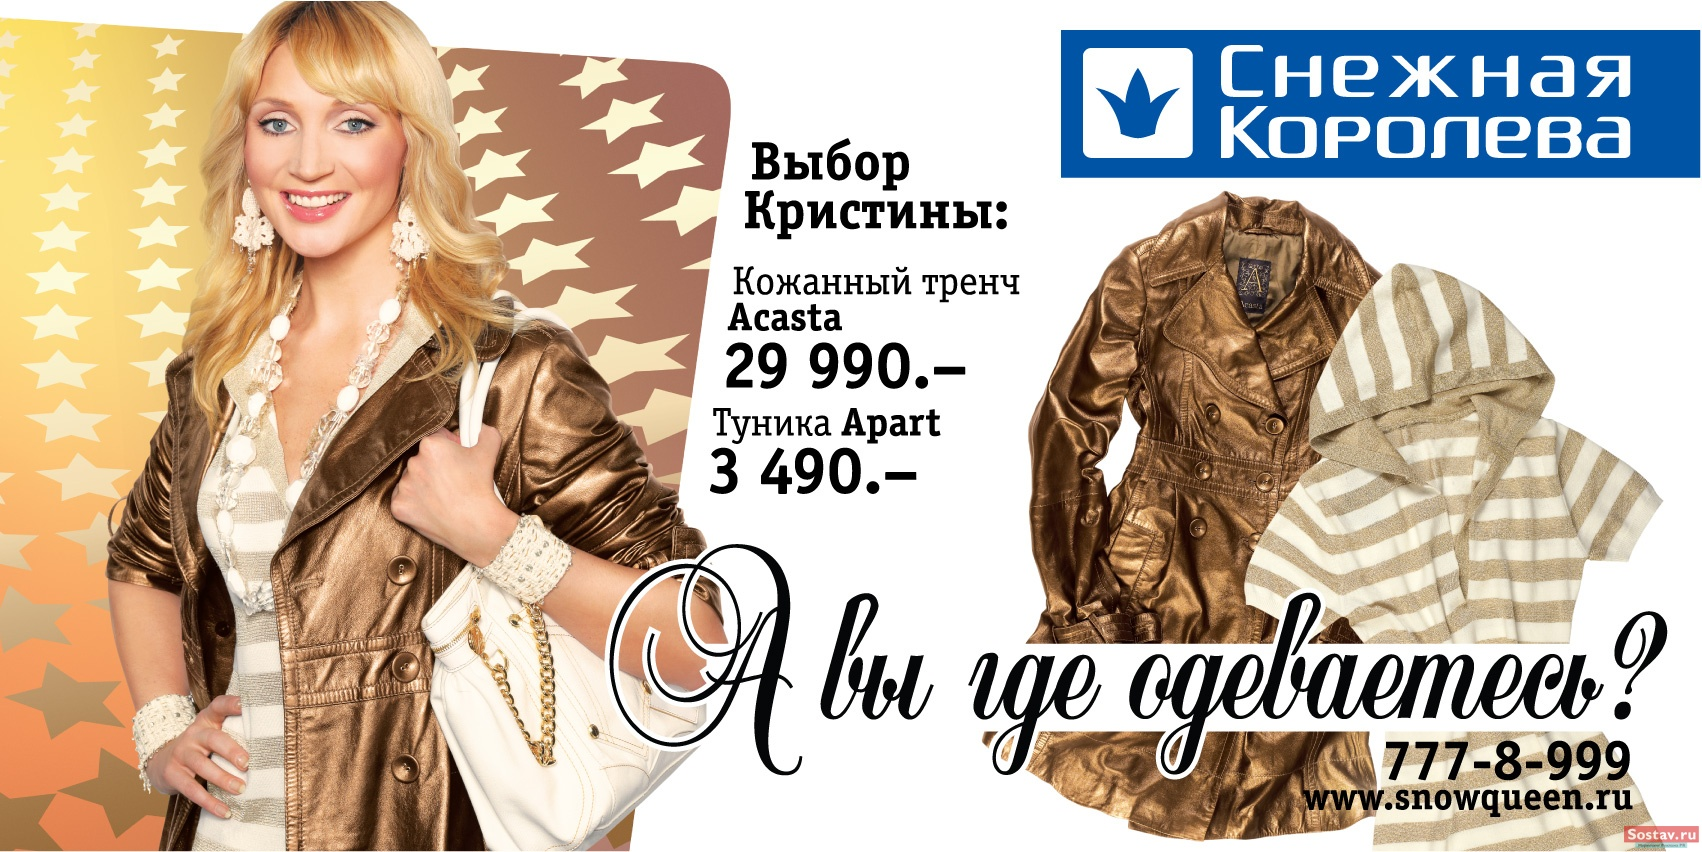 Снежная Королева Каталог Одежда